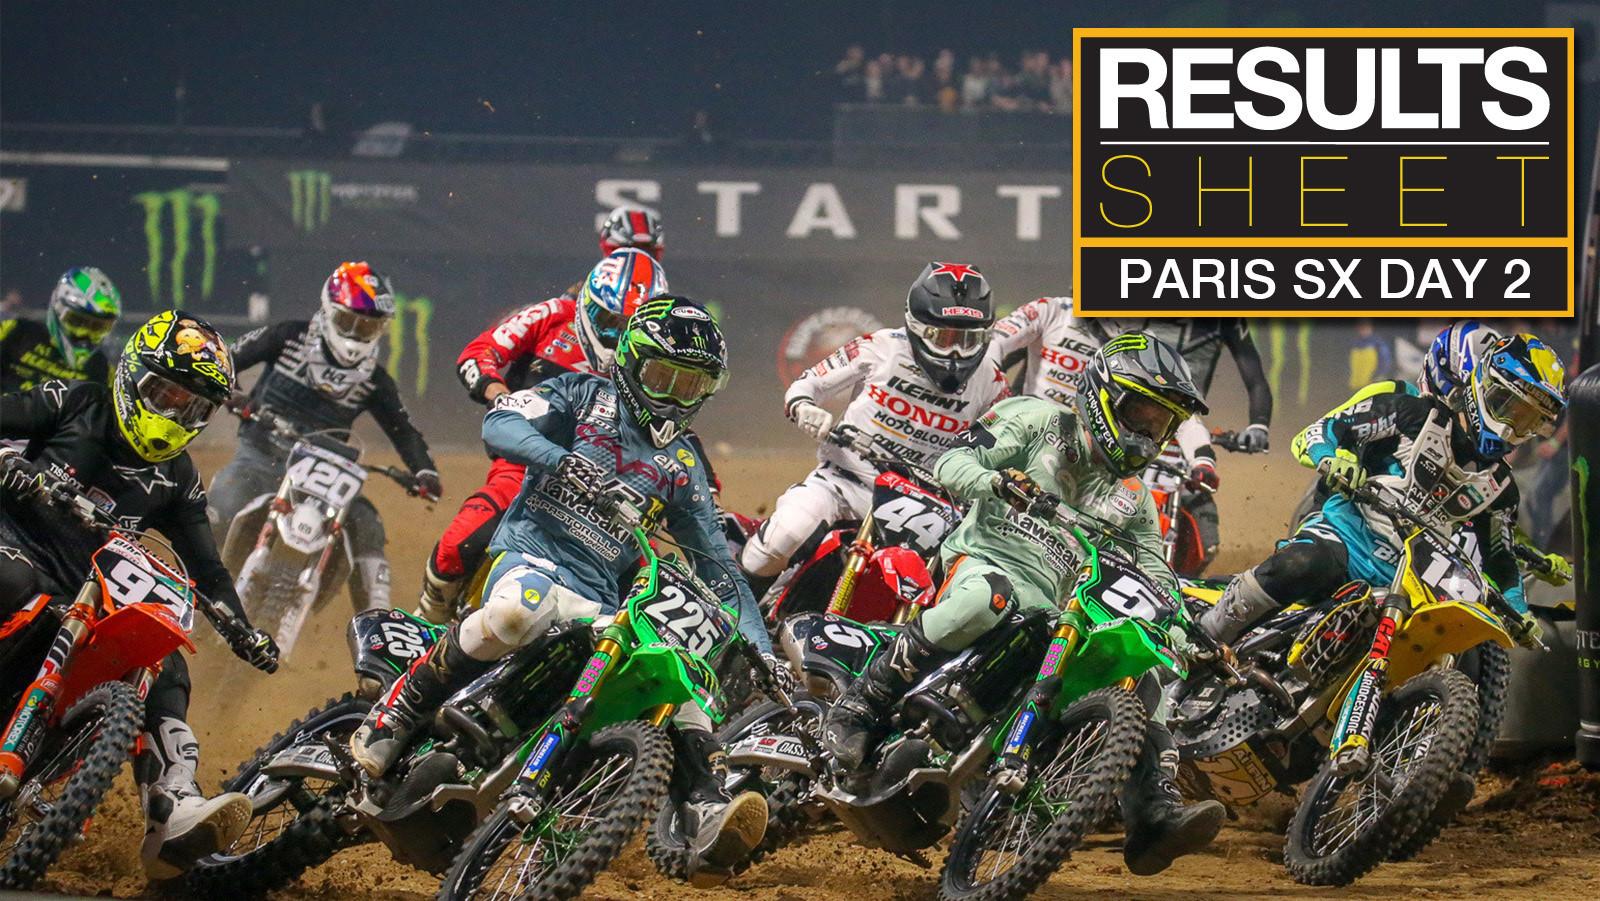 Results Sheet: Sunday Paris Supercross